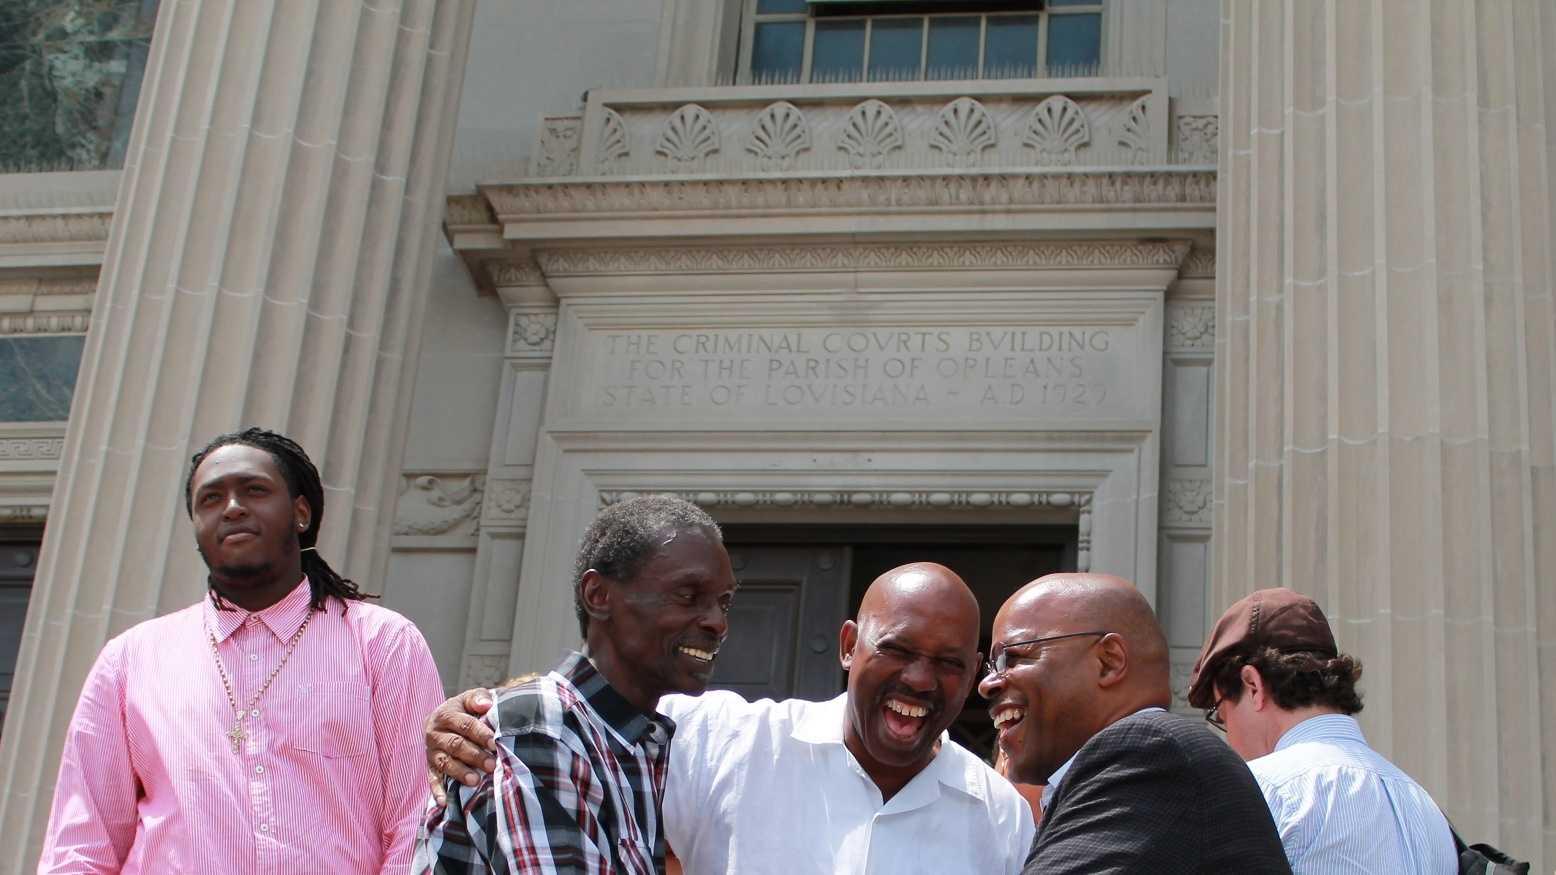 Reginald Adams released after 34 years